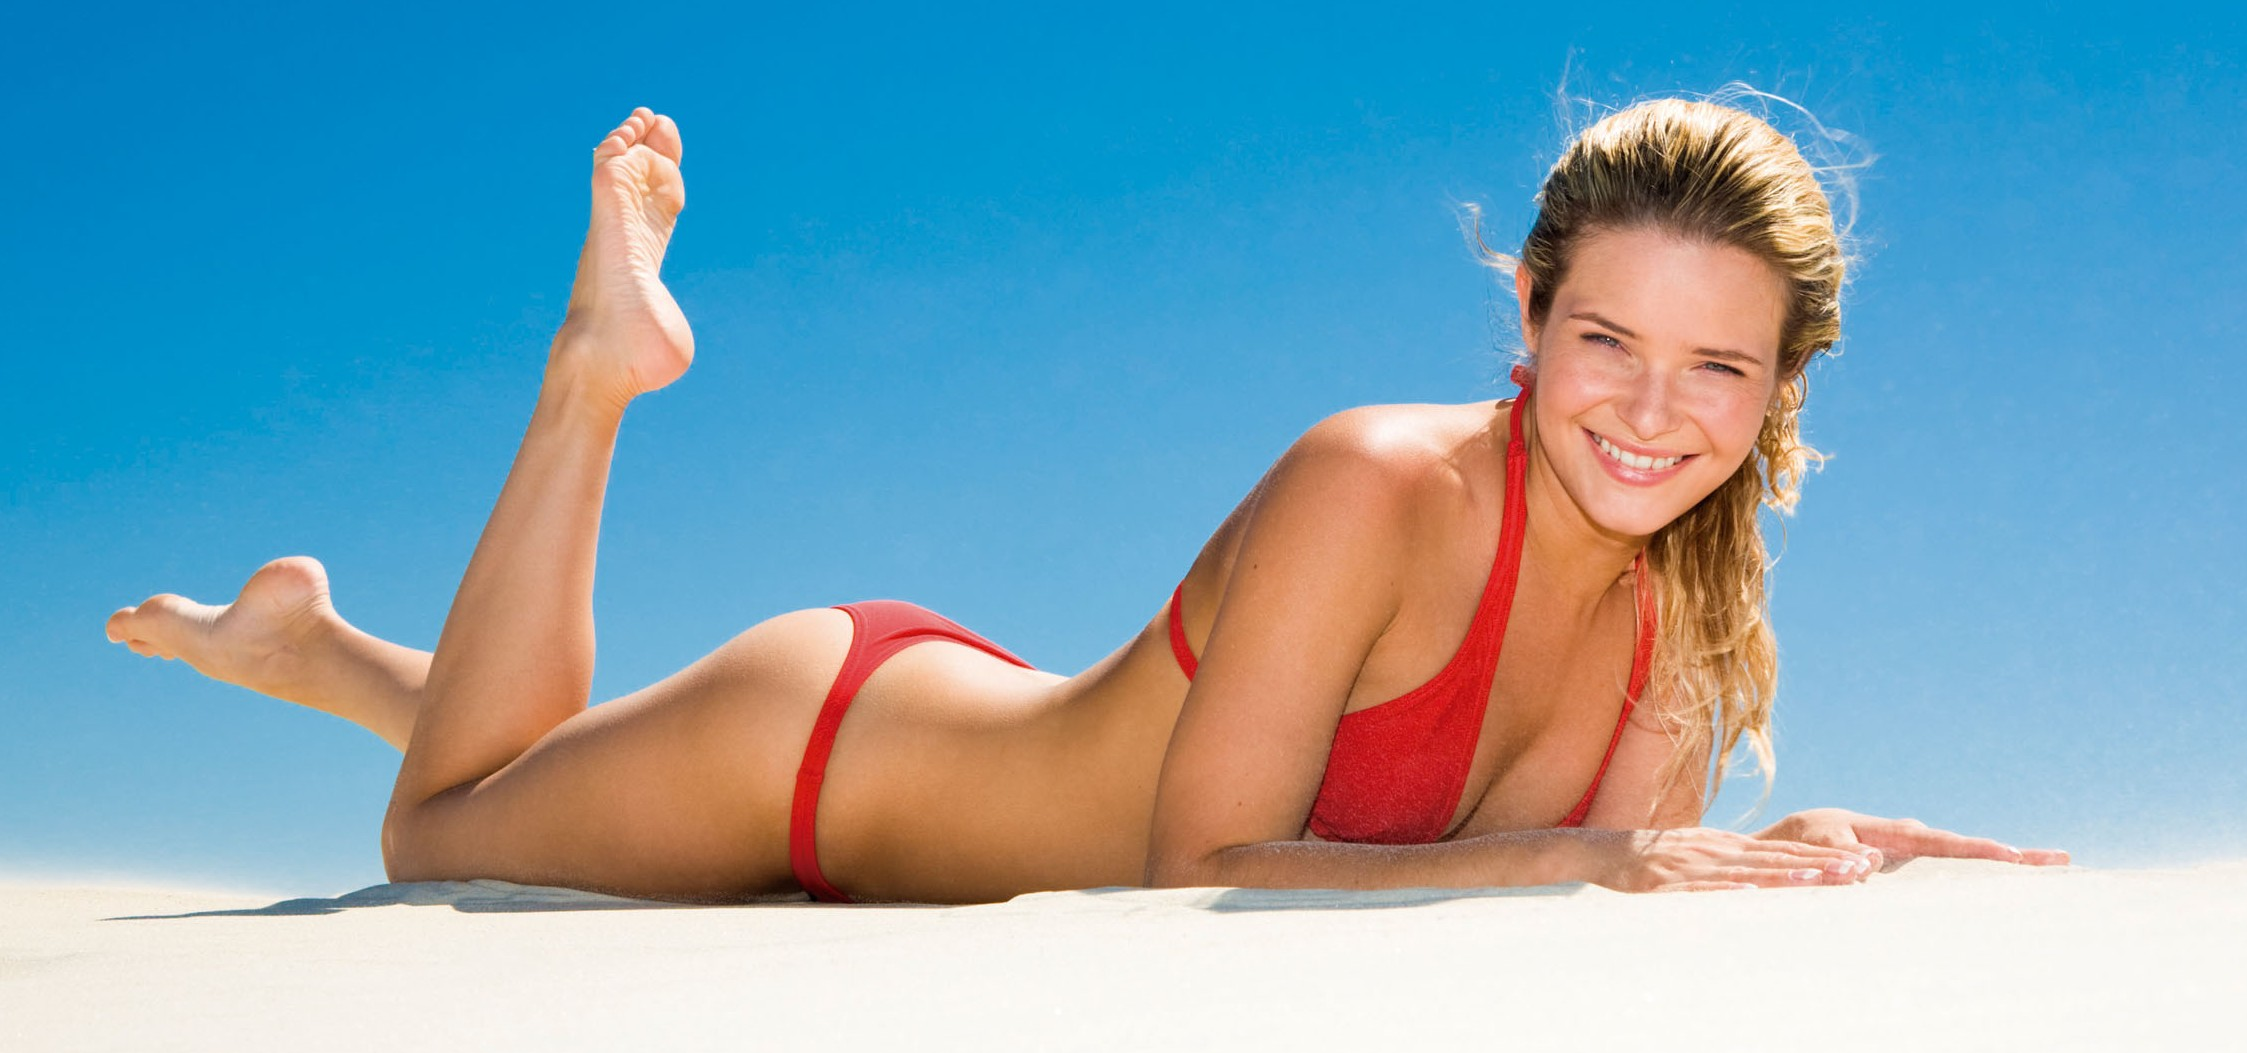 chica tomando sol playa